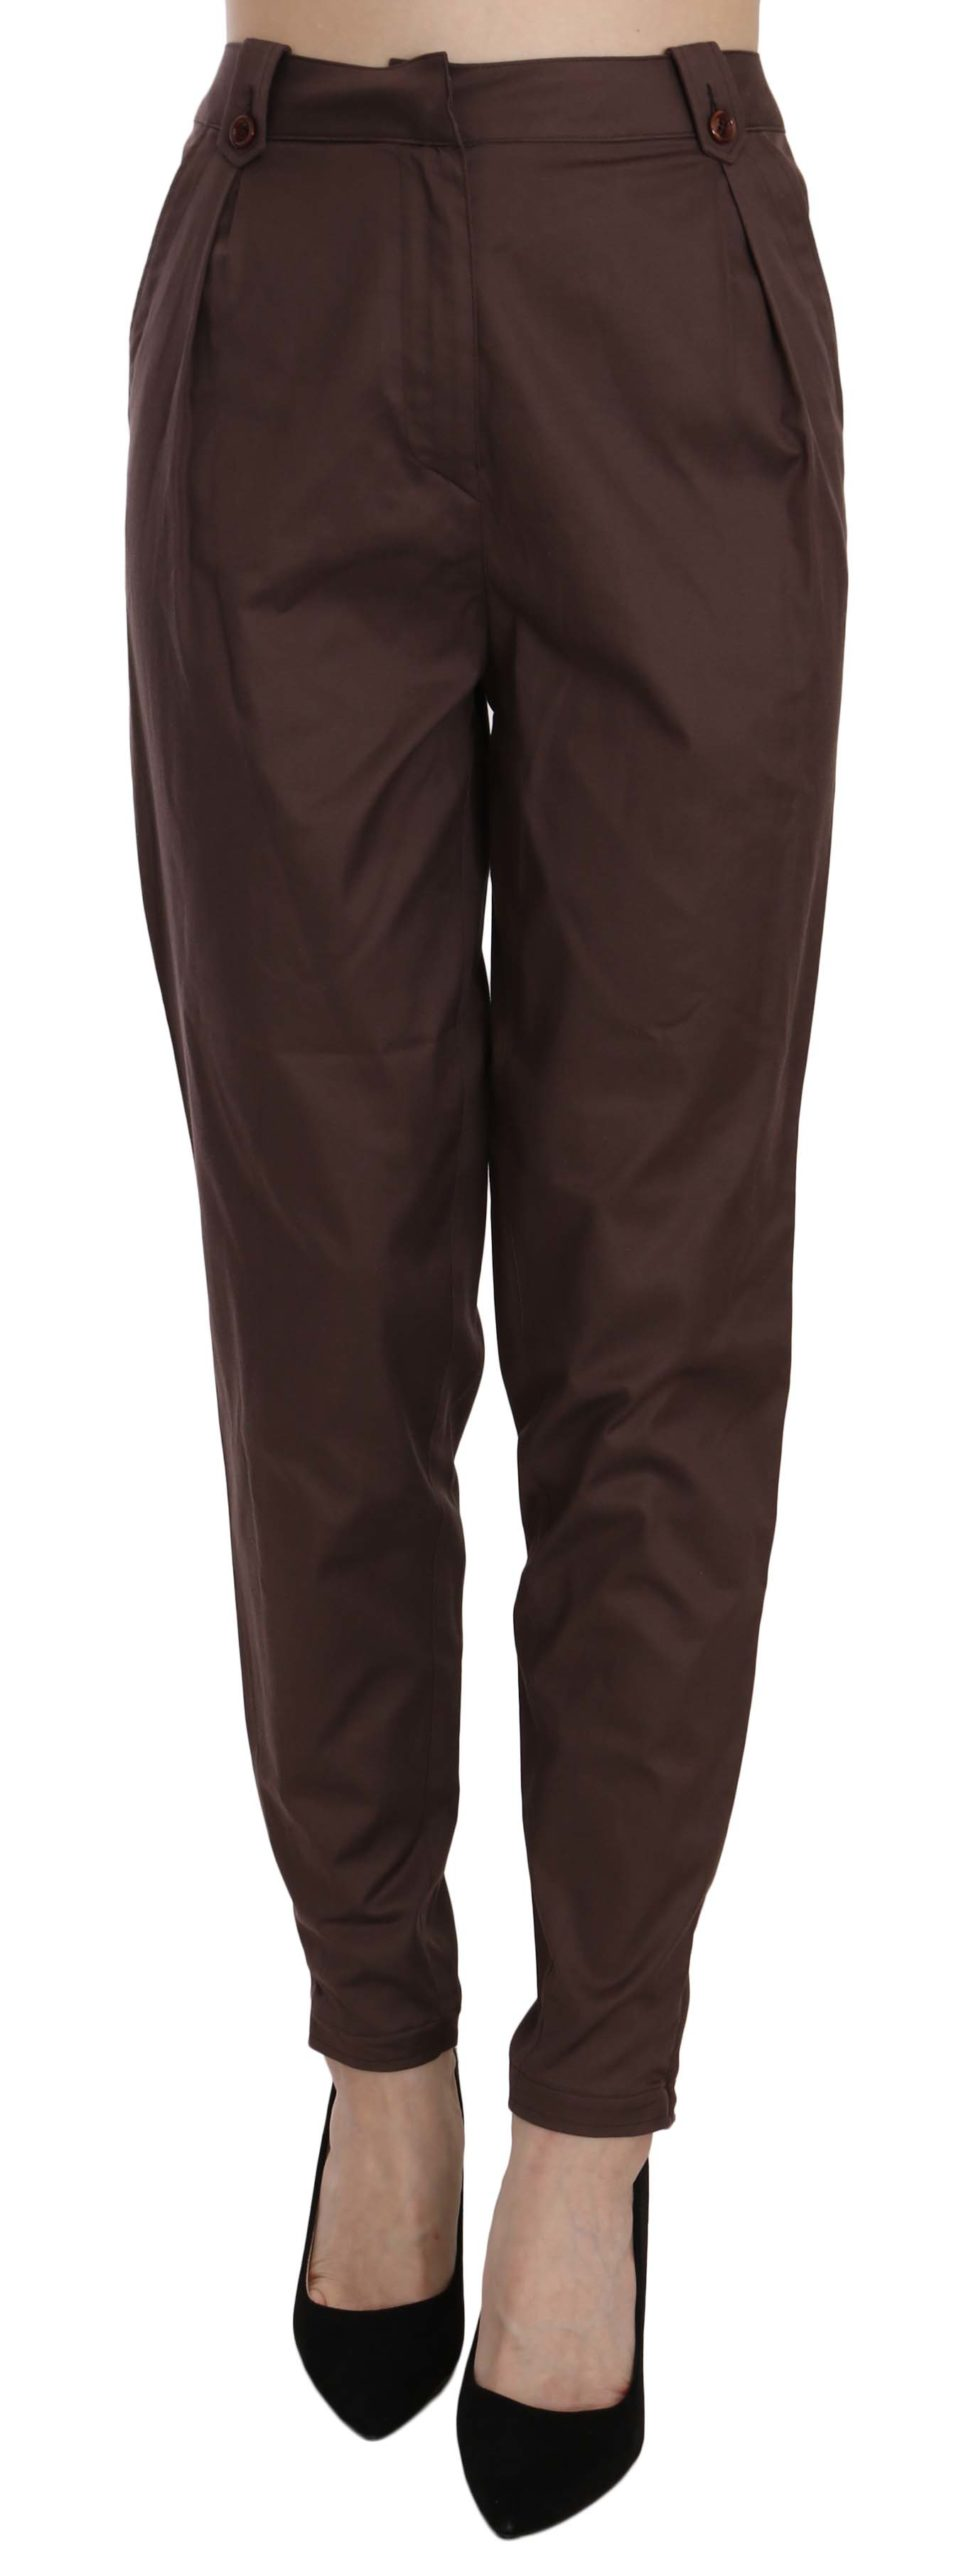 Just Cavalli Women's High Waist Tapered Trouser Brown PAN70332 - IT40 S